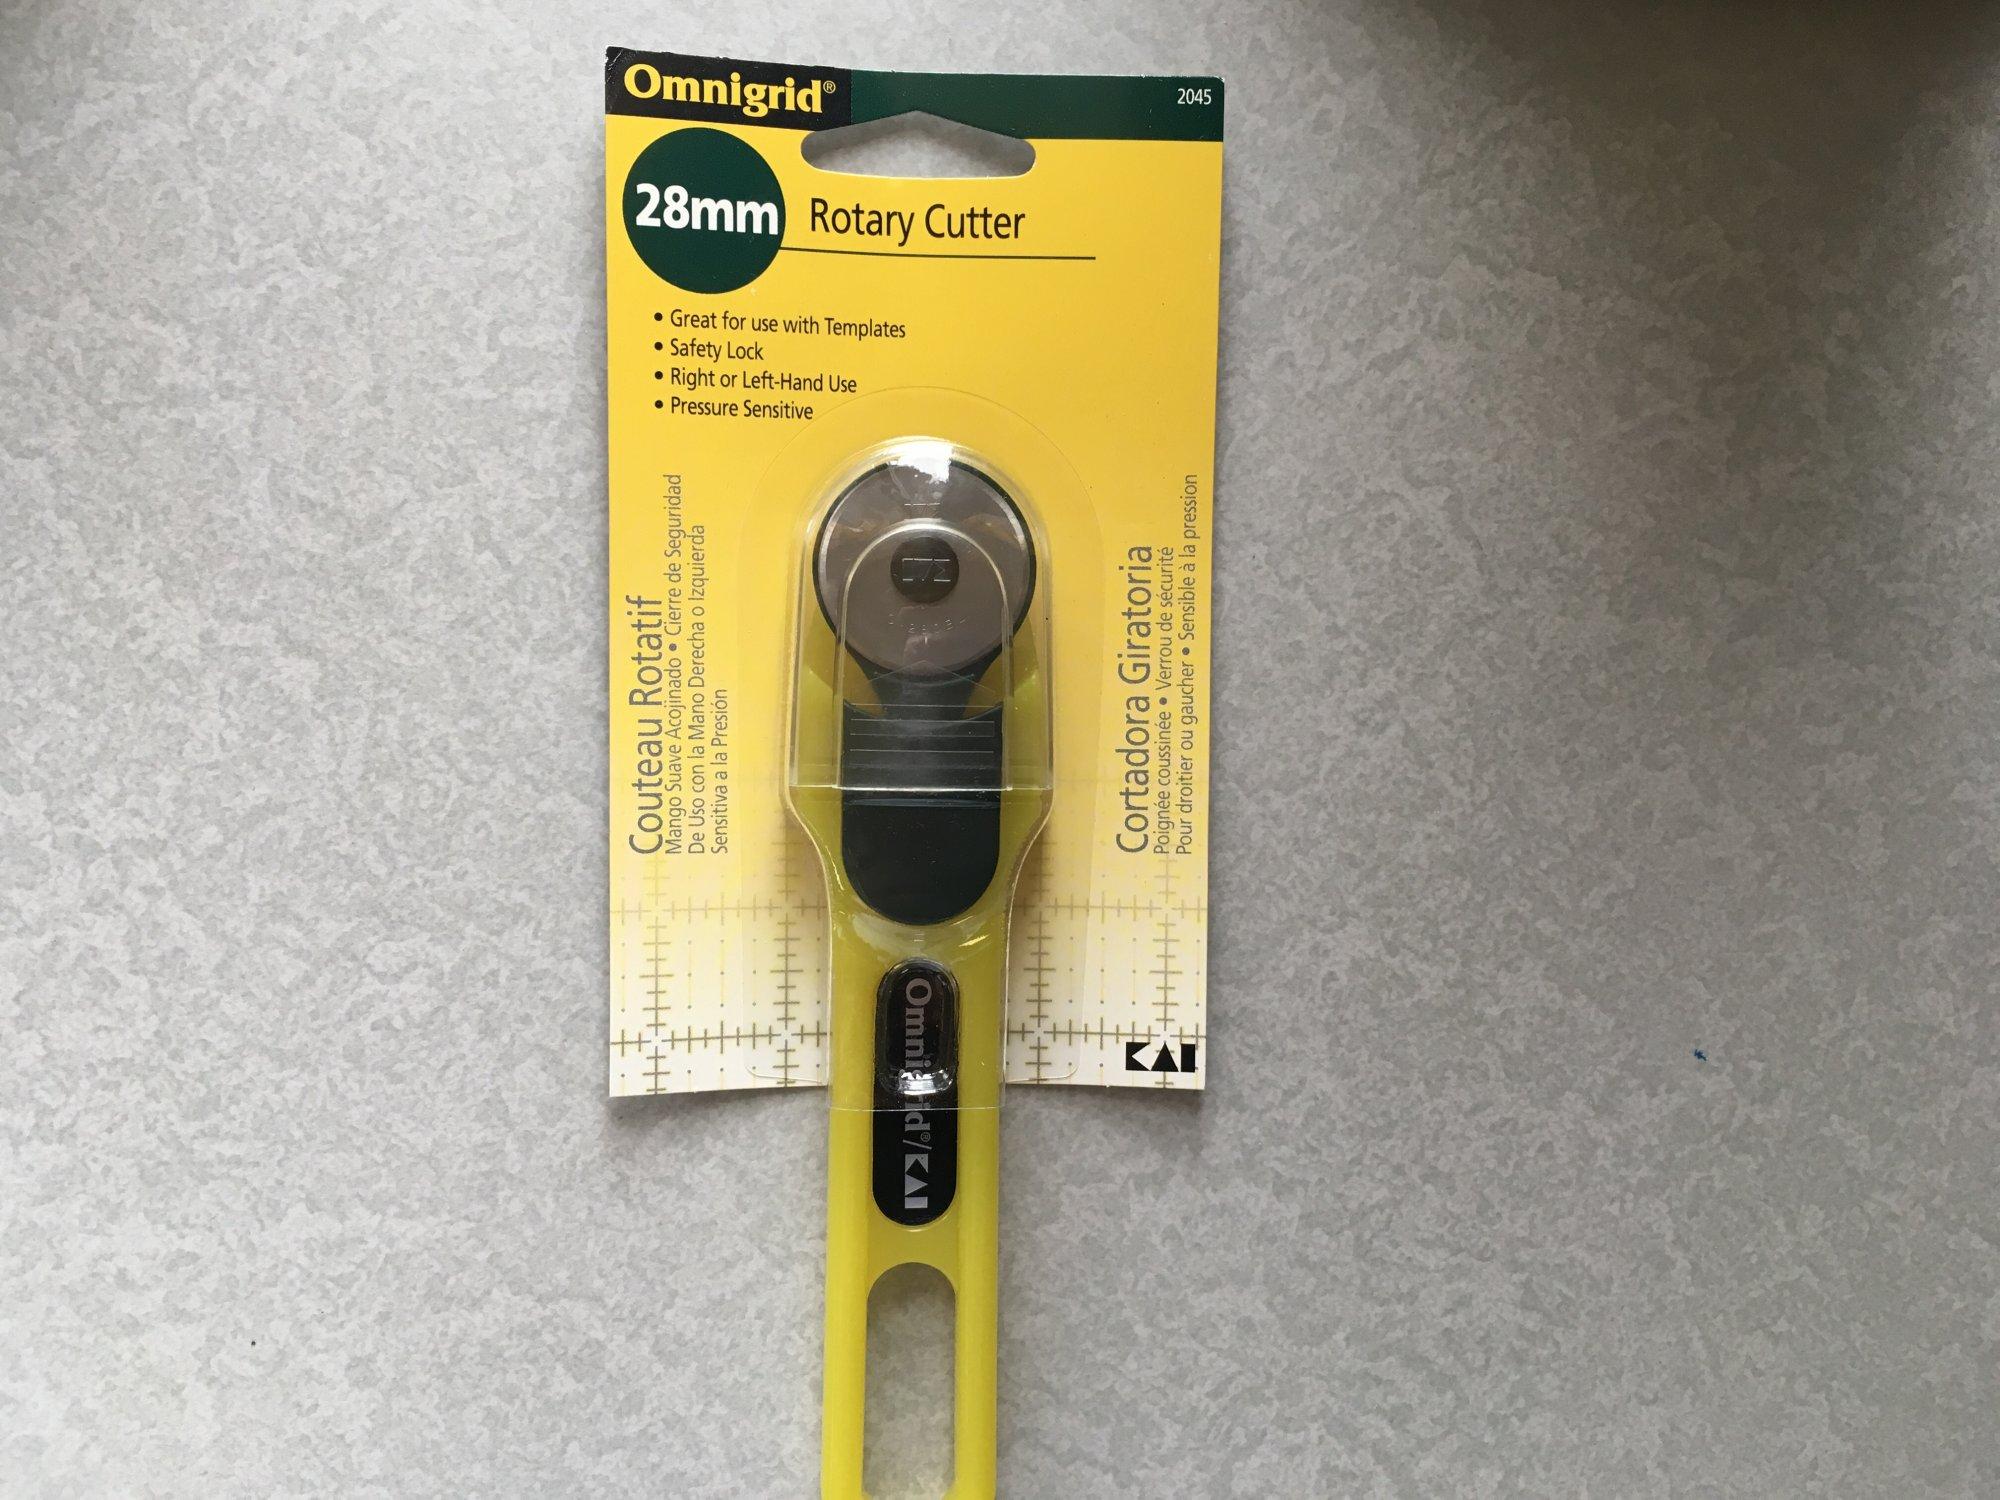 28mm Rotary Cutter OMNIGRID 2045